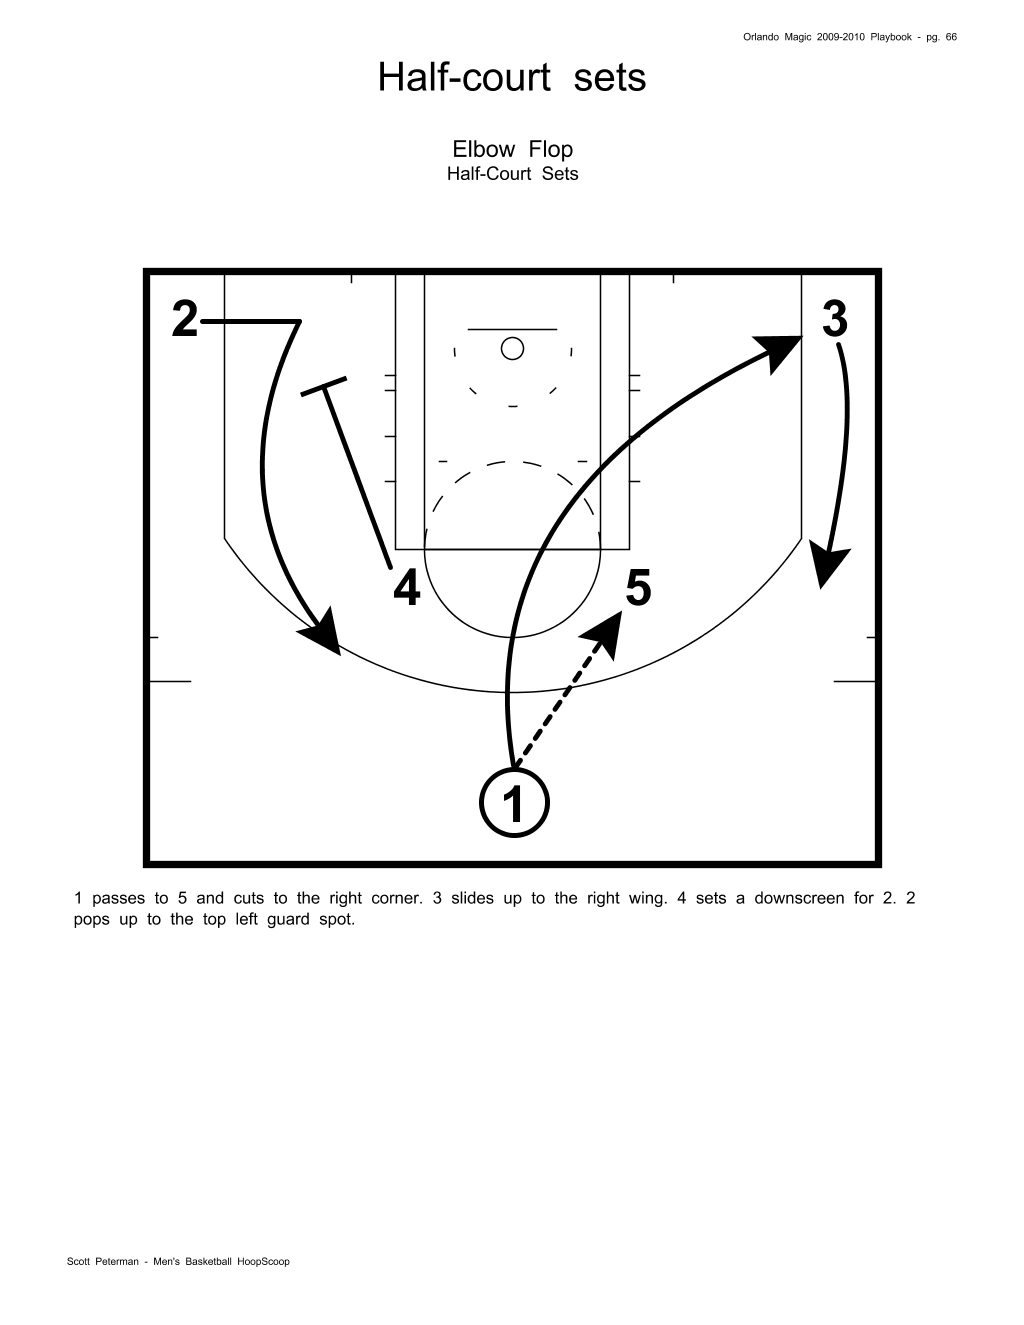 printable basketball court diagrams for plays venn diagram of animal cell and plant half car interior design